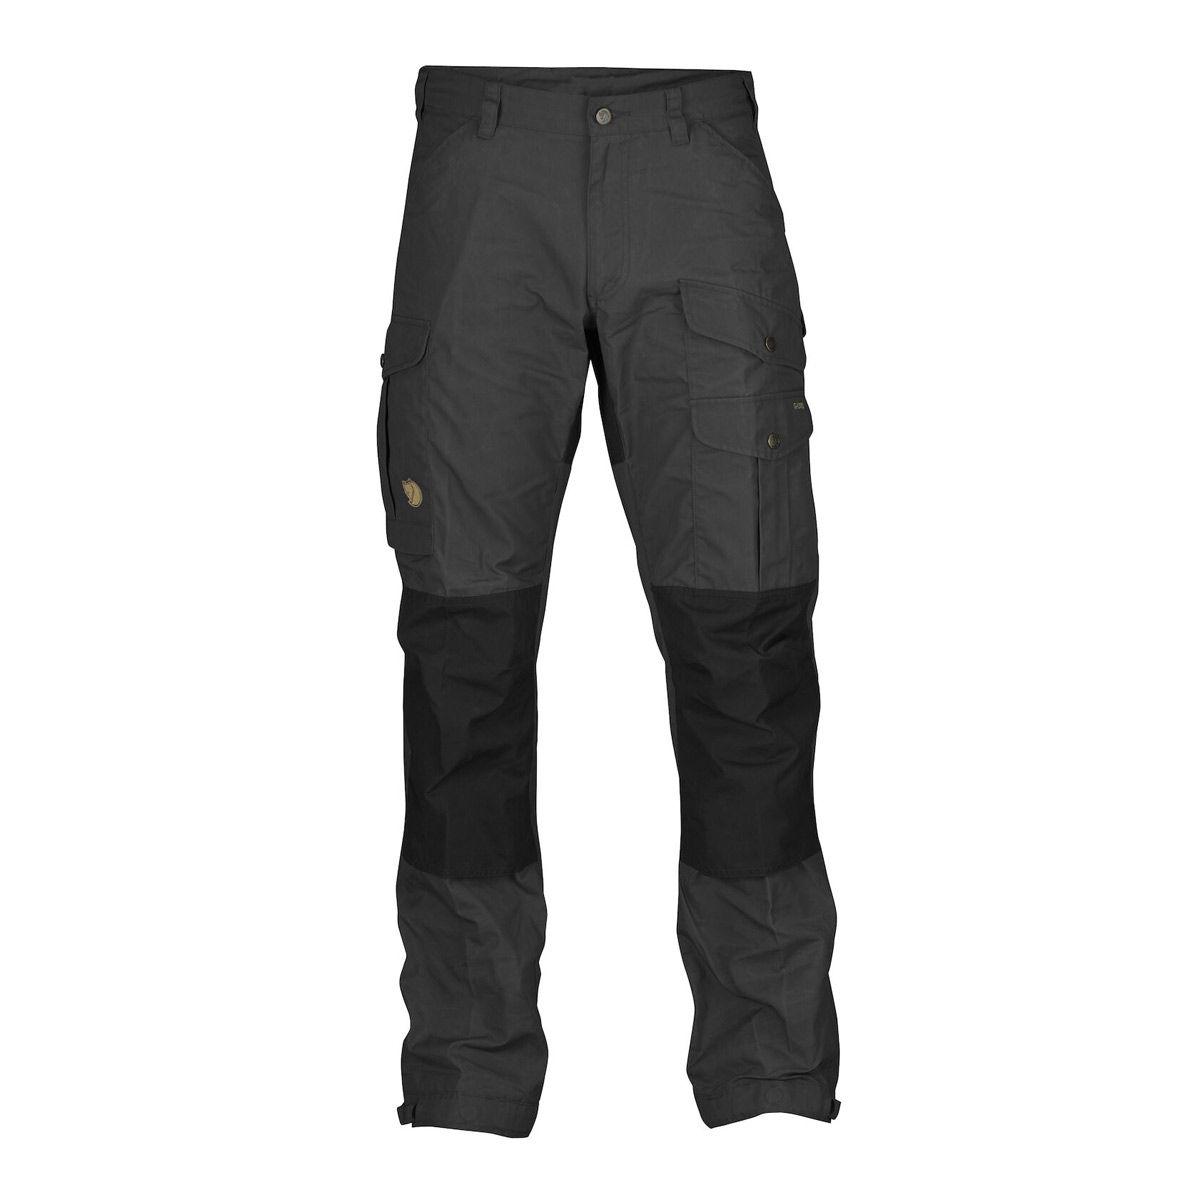 Fjallraven Vidda Pro Regular Trousers - Dark Grey/Black